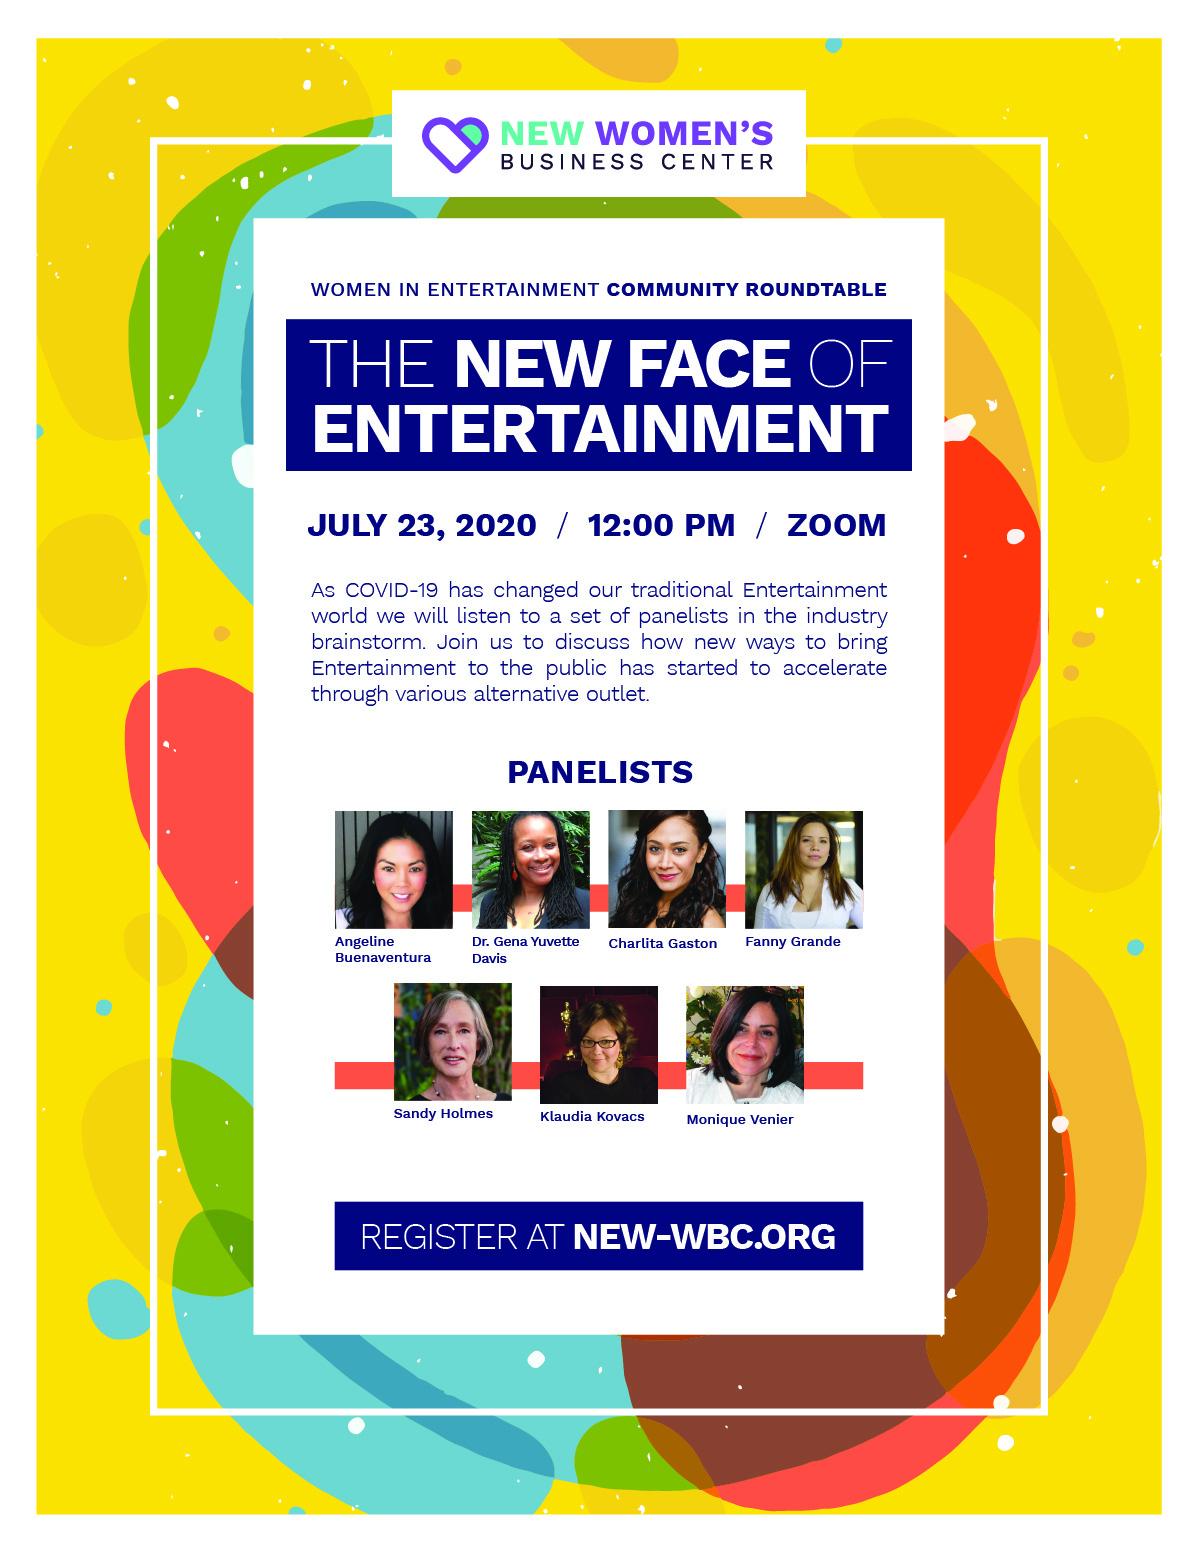 NEW-WBC Community Roundtable program flyer built by CHIMENTO Agency